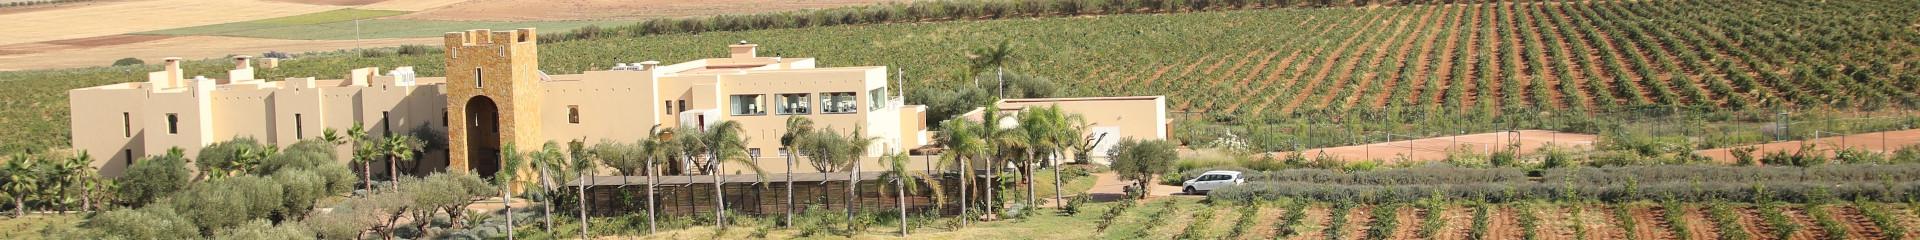 Tandem Process Partner - Vue vignoble au Maroc